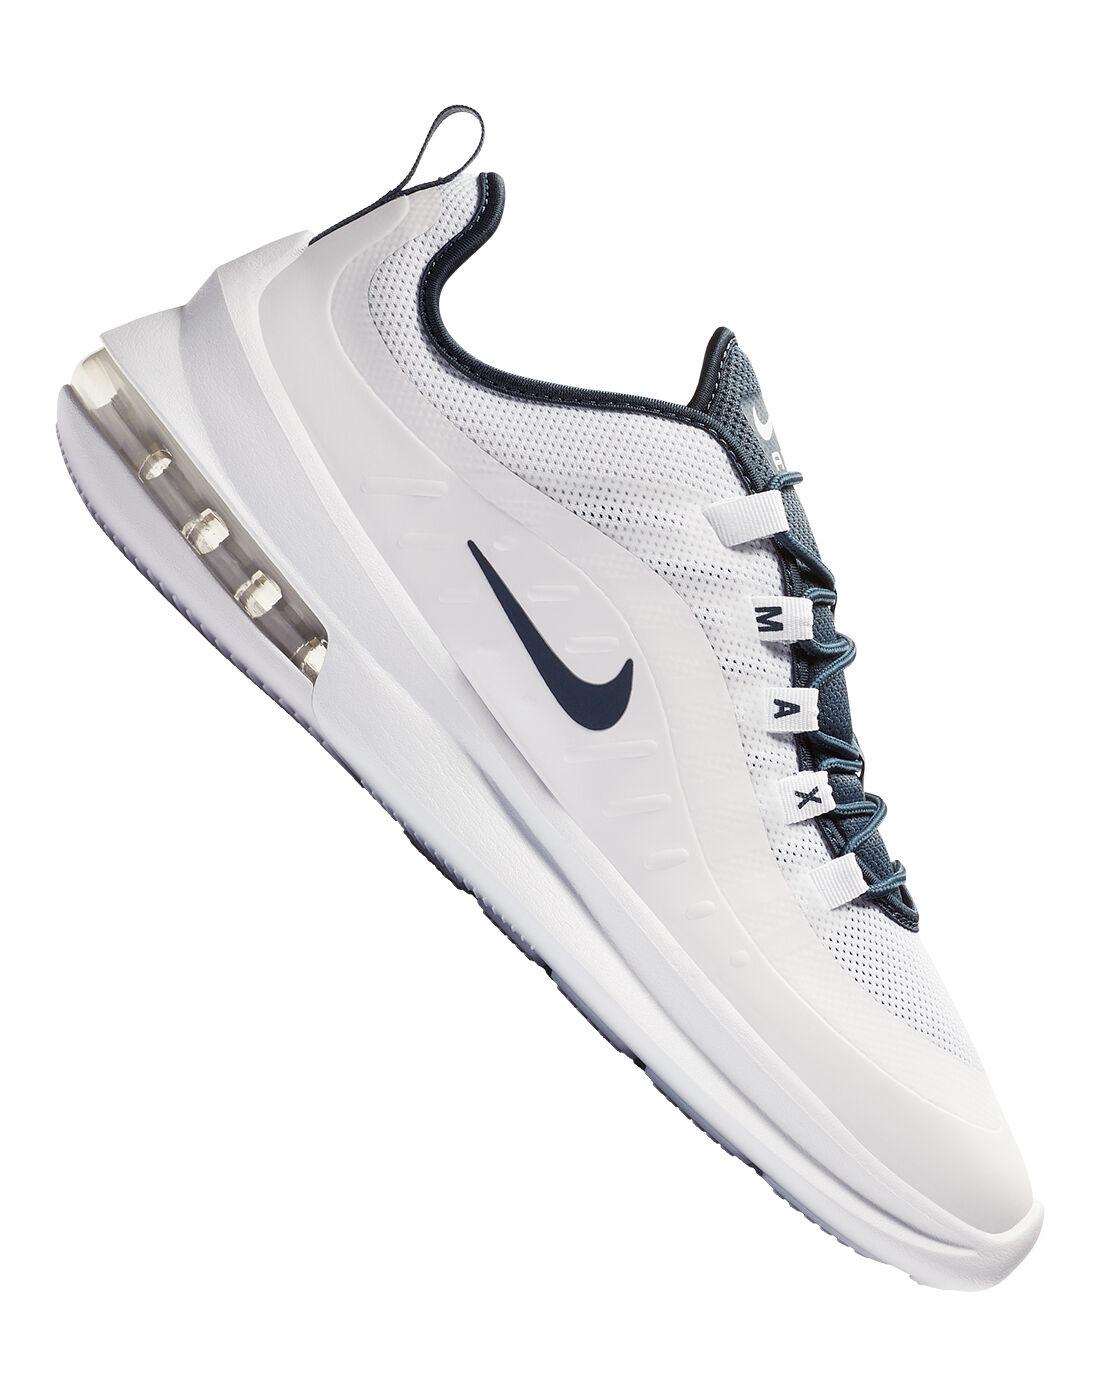 Men's White Nike Air Max Axis | Life Style Sports